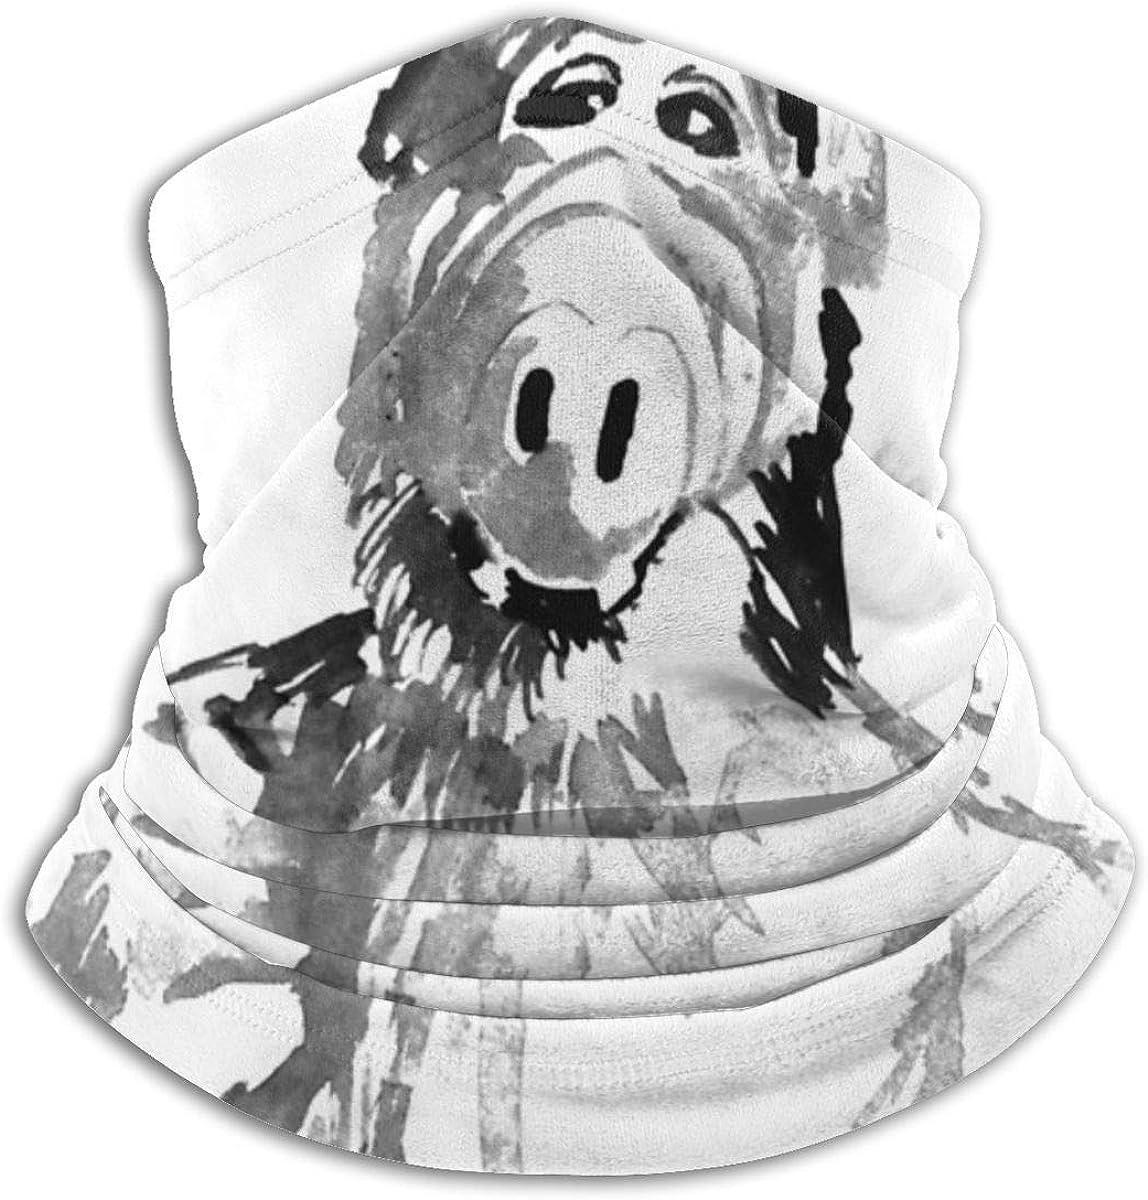 Schals Halstuch Nascb Fran-Kfurt Magic Headwear Sturmhaube Facescarf Stirnband